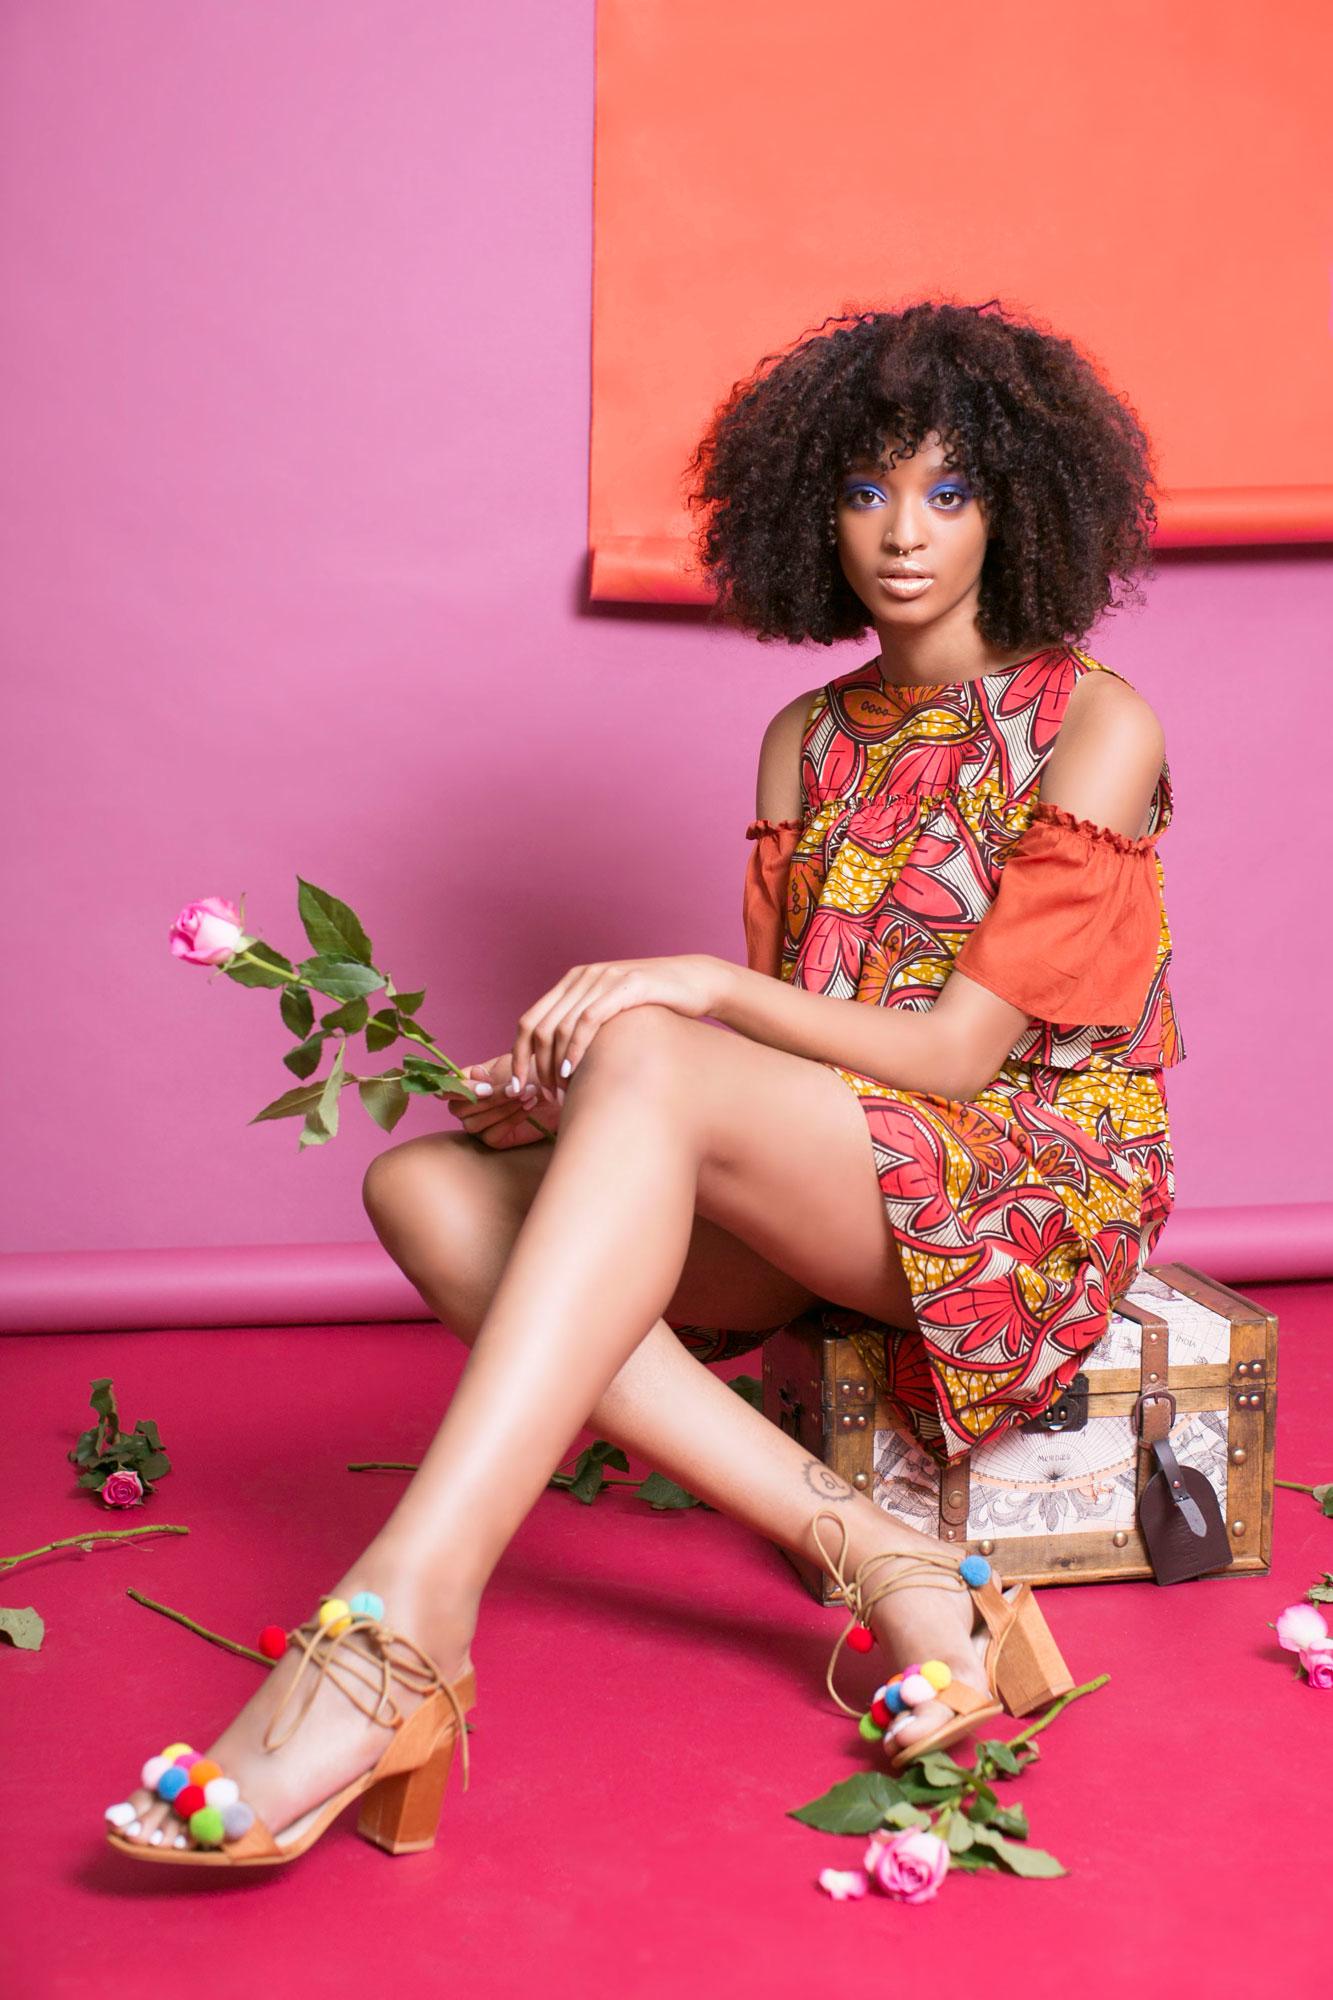 frida_pink_dress_105_150